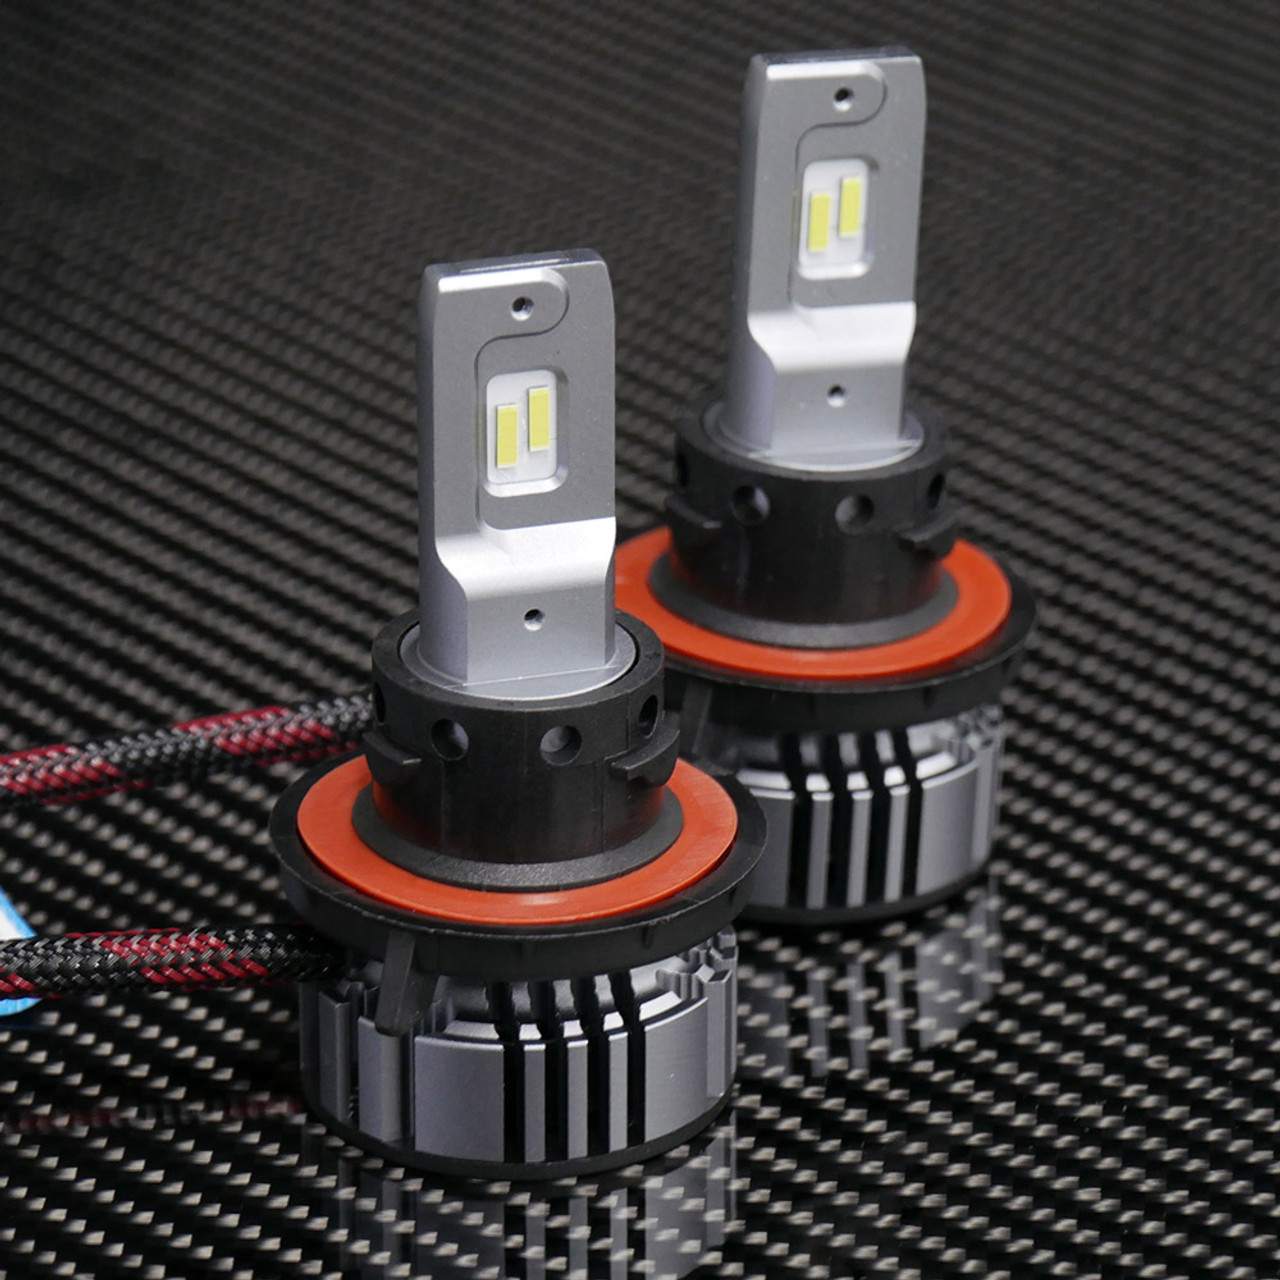 Supernova V4 Led Headlights H13 Bulbs In Addition Halogen Light On Series Circuit Voltage Headlight